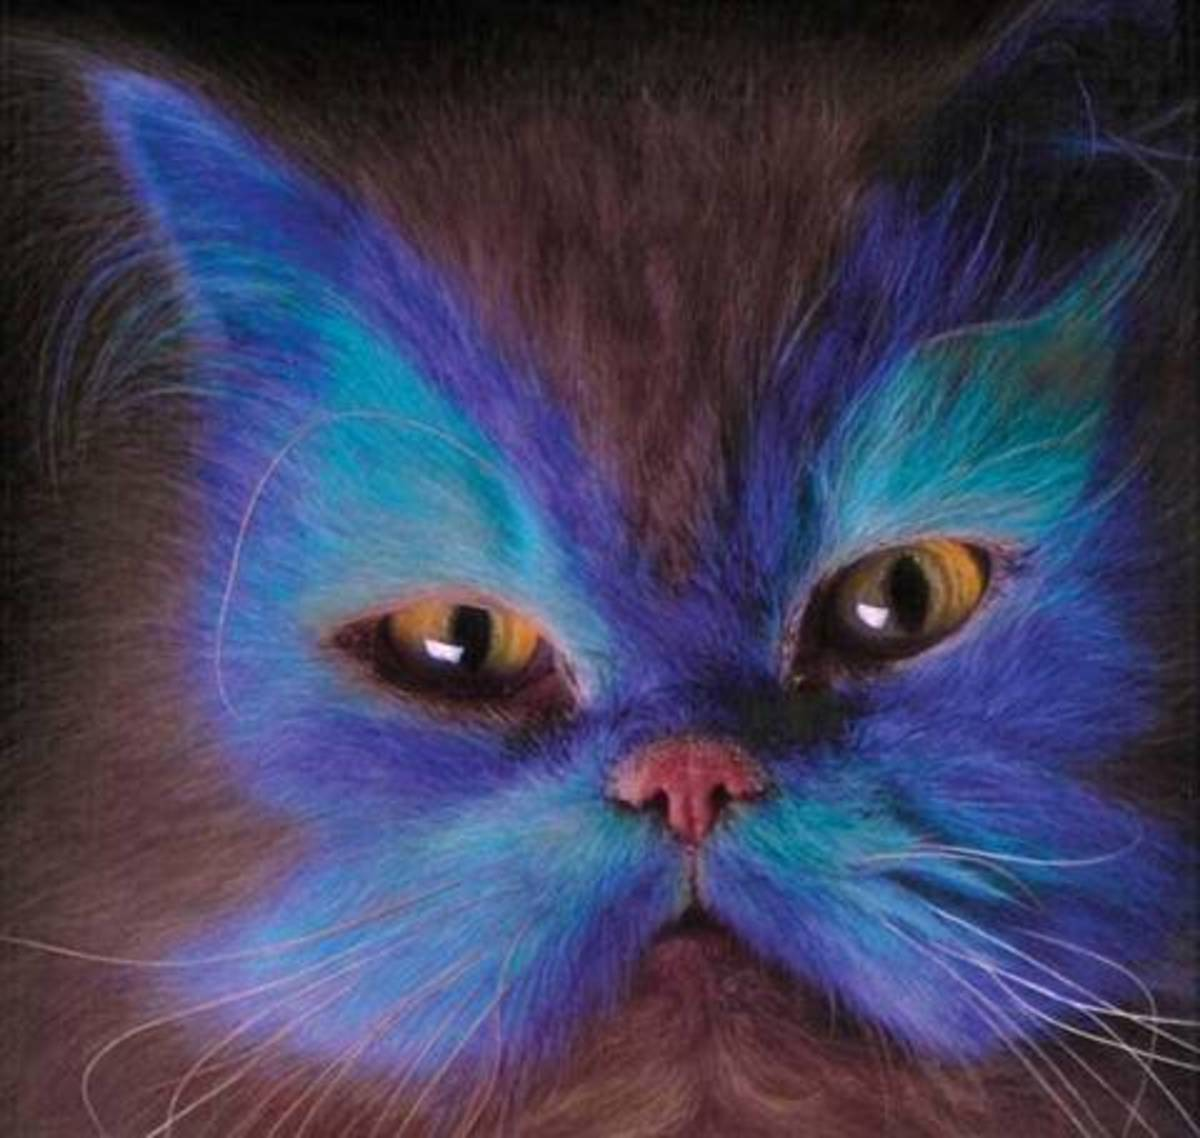 Smurf face Cat.